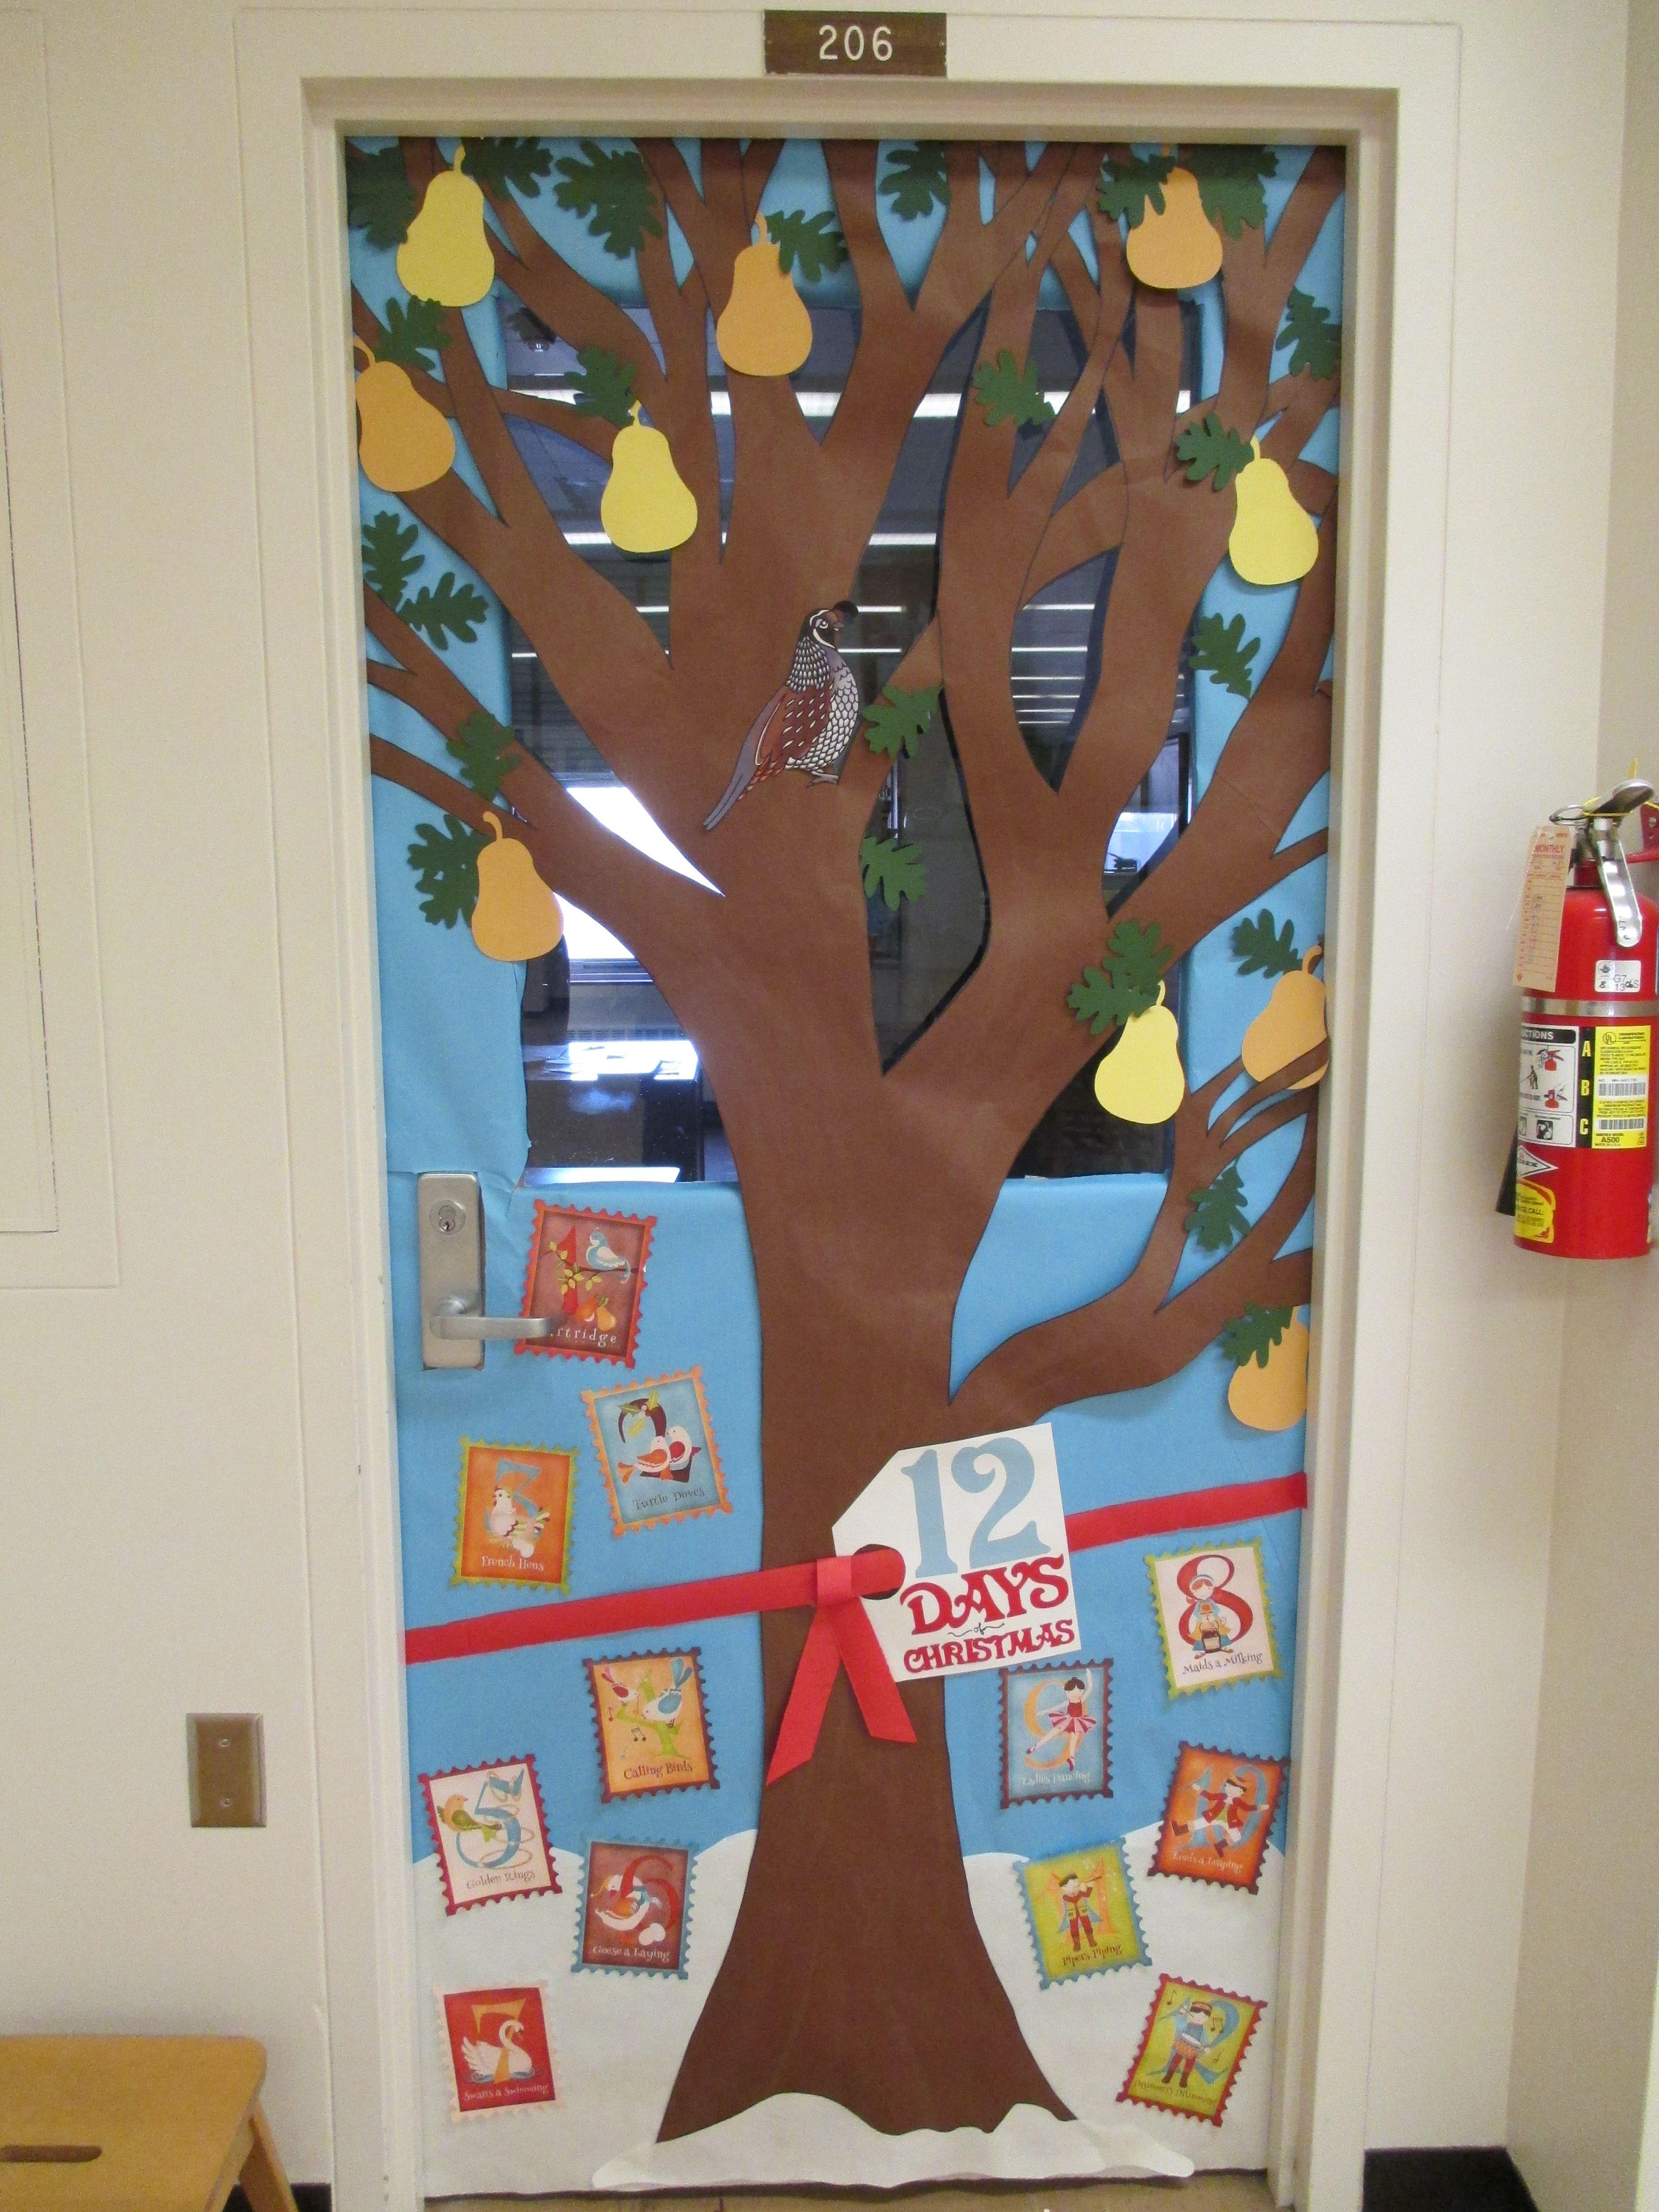 12 days of christmas door decorating ideas